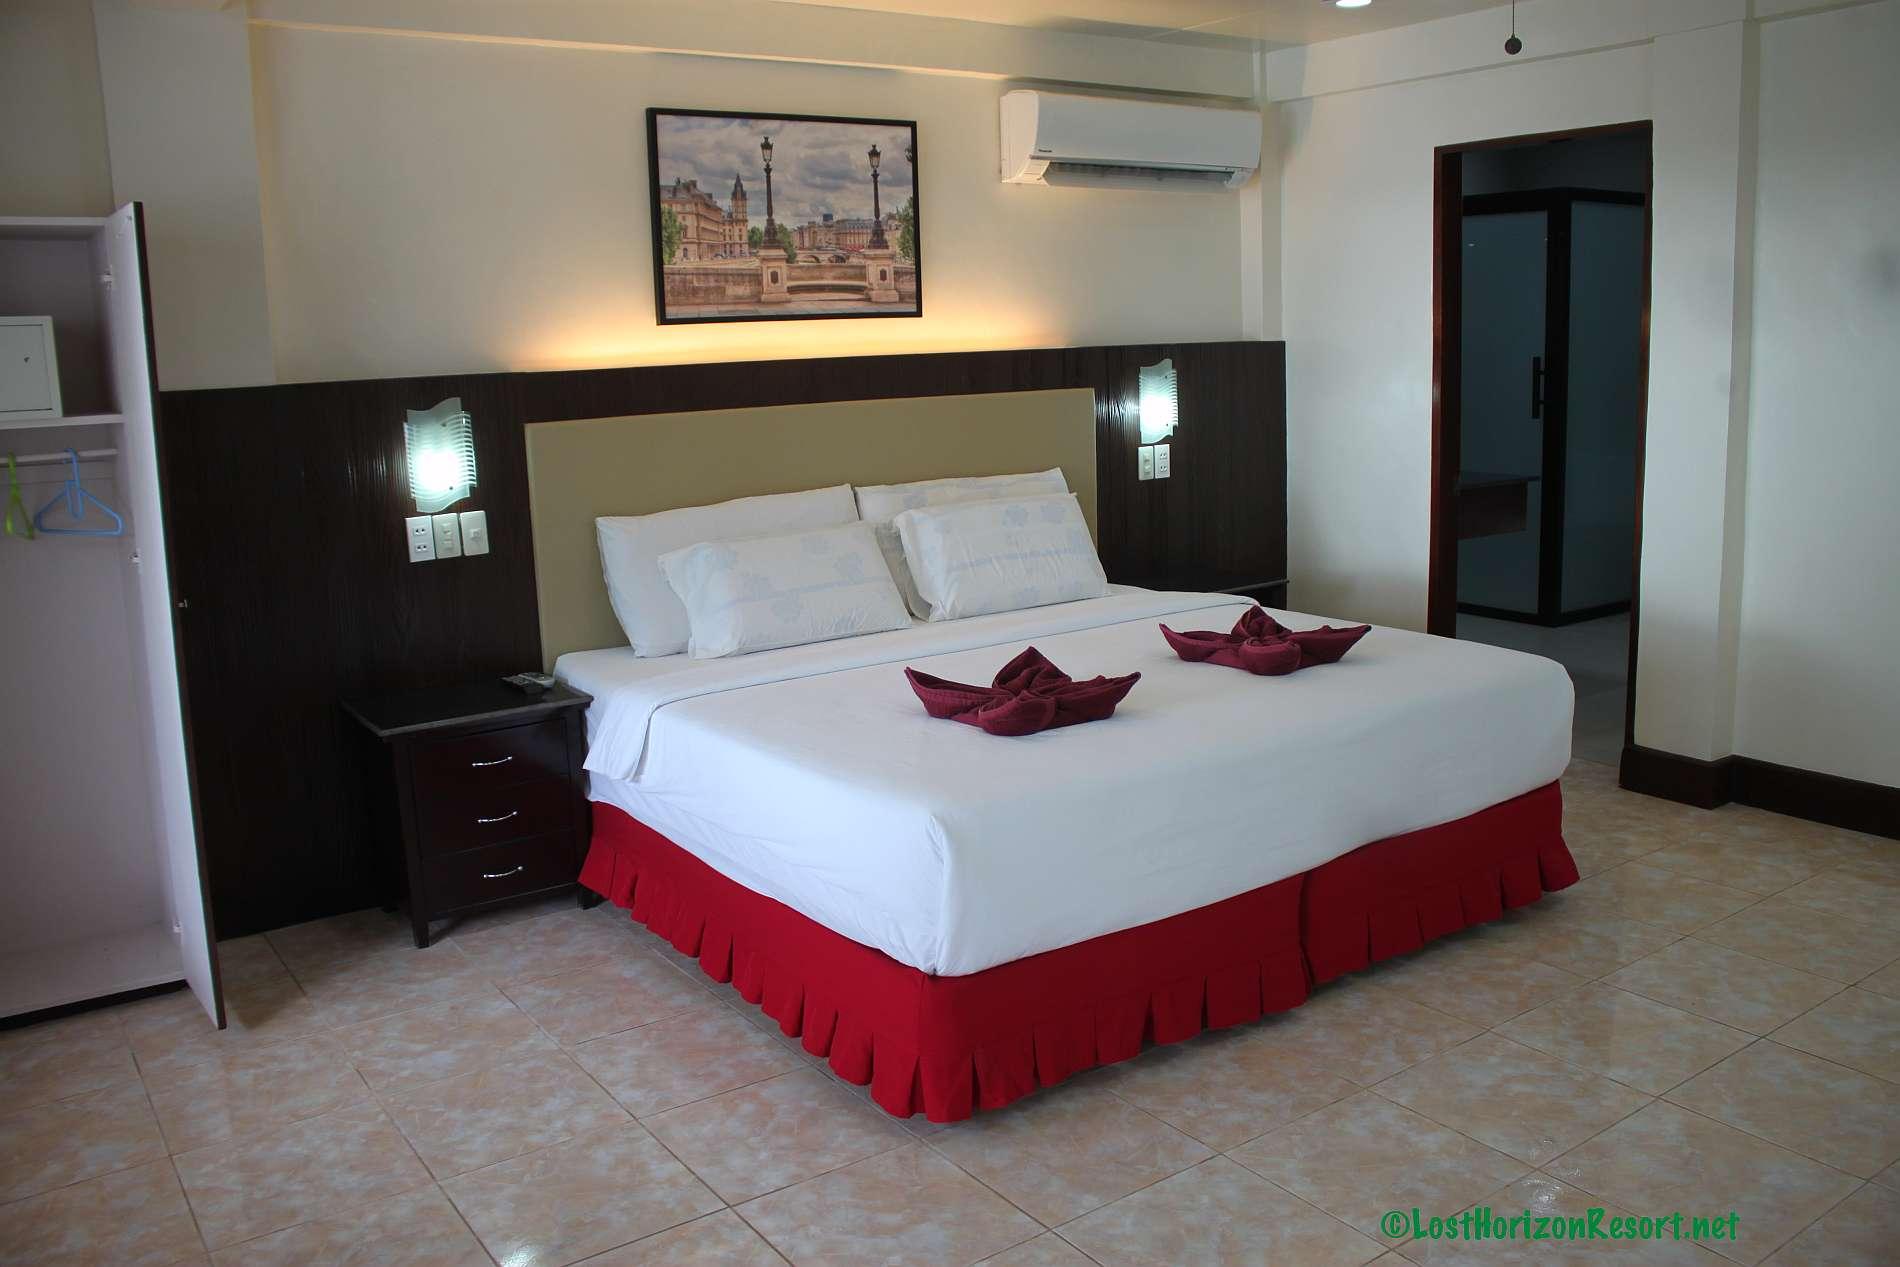 Lost-Horizon-Beach-Resort-Alona-Beach-Panglao-Bohol-Philippines-sun-view-room020